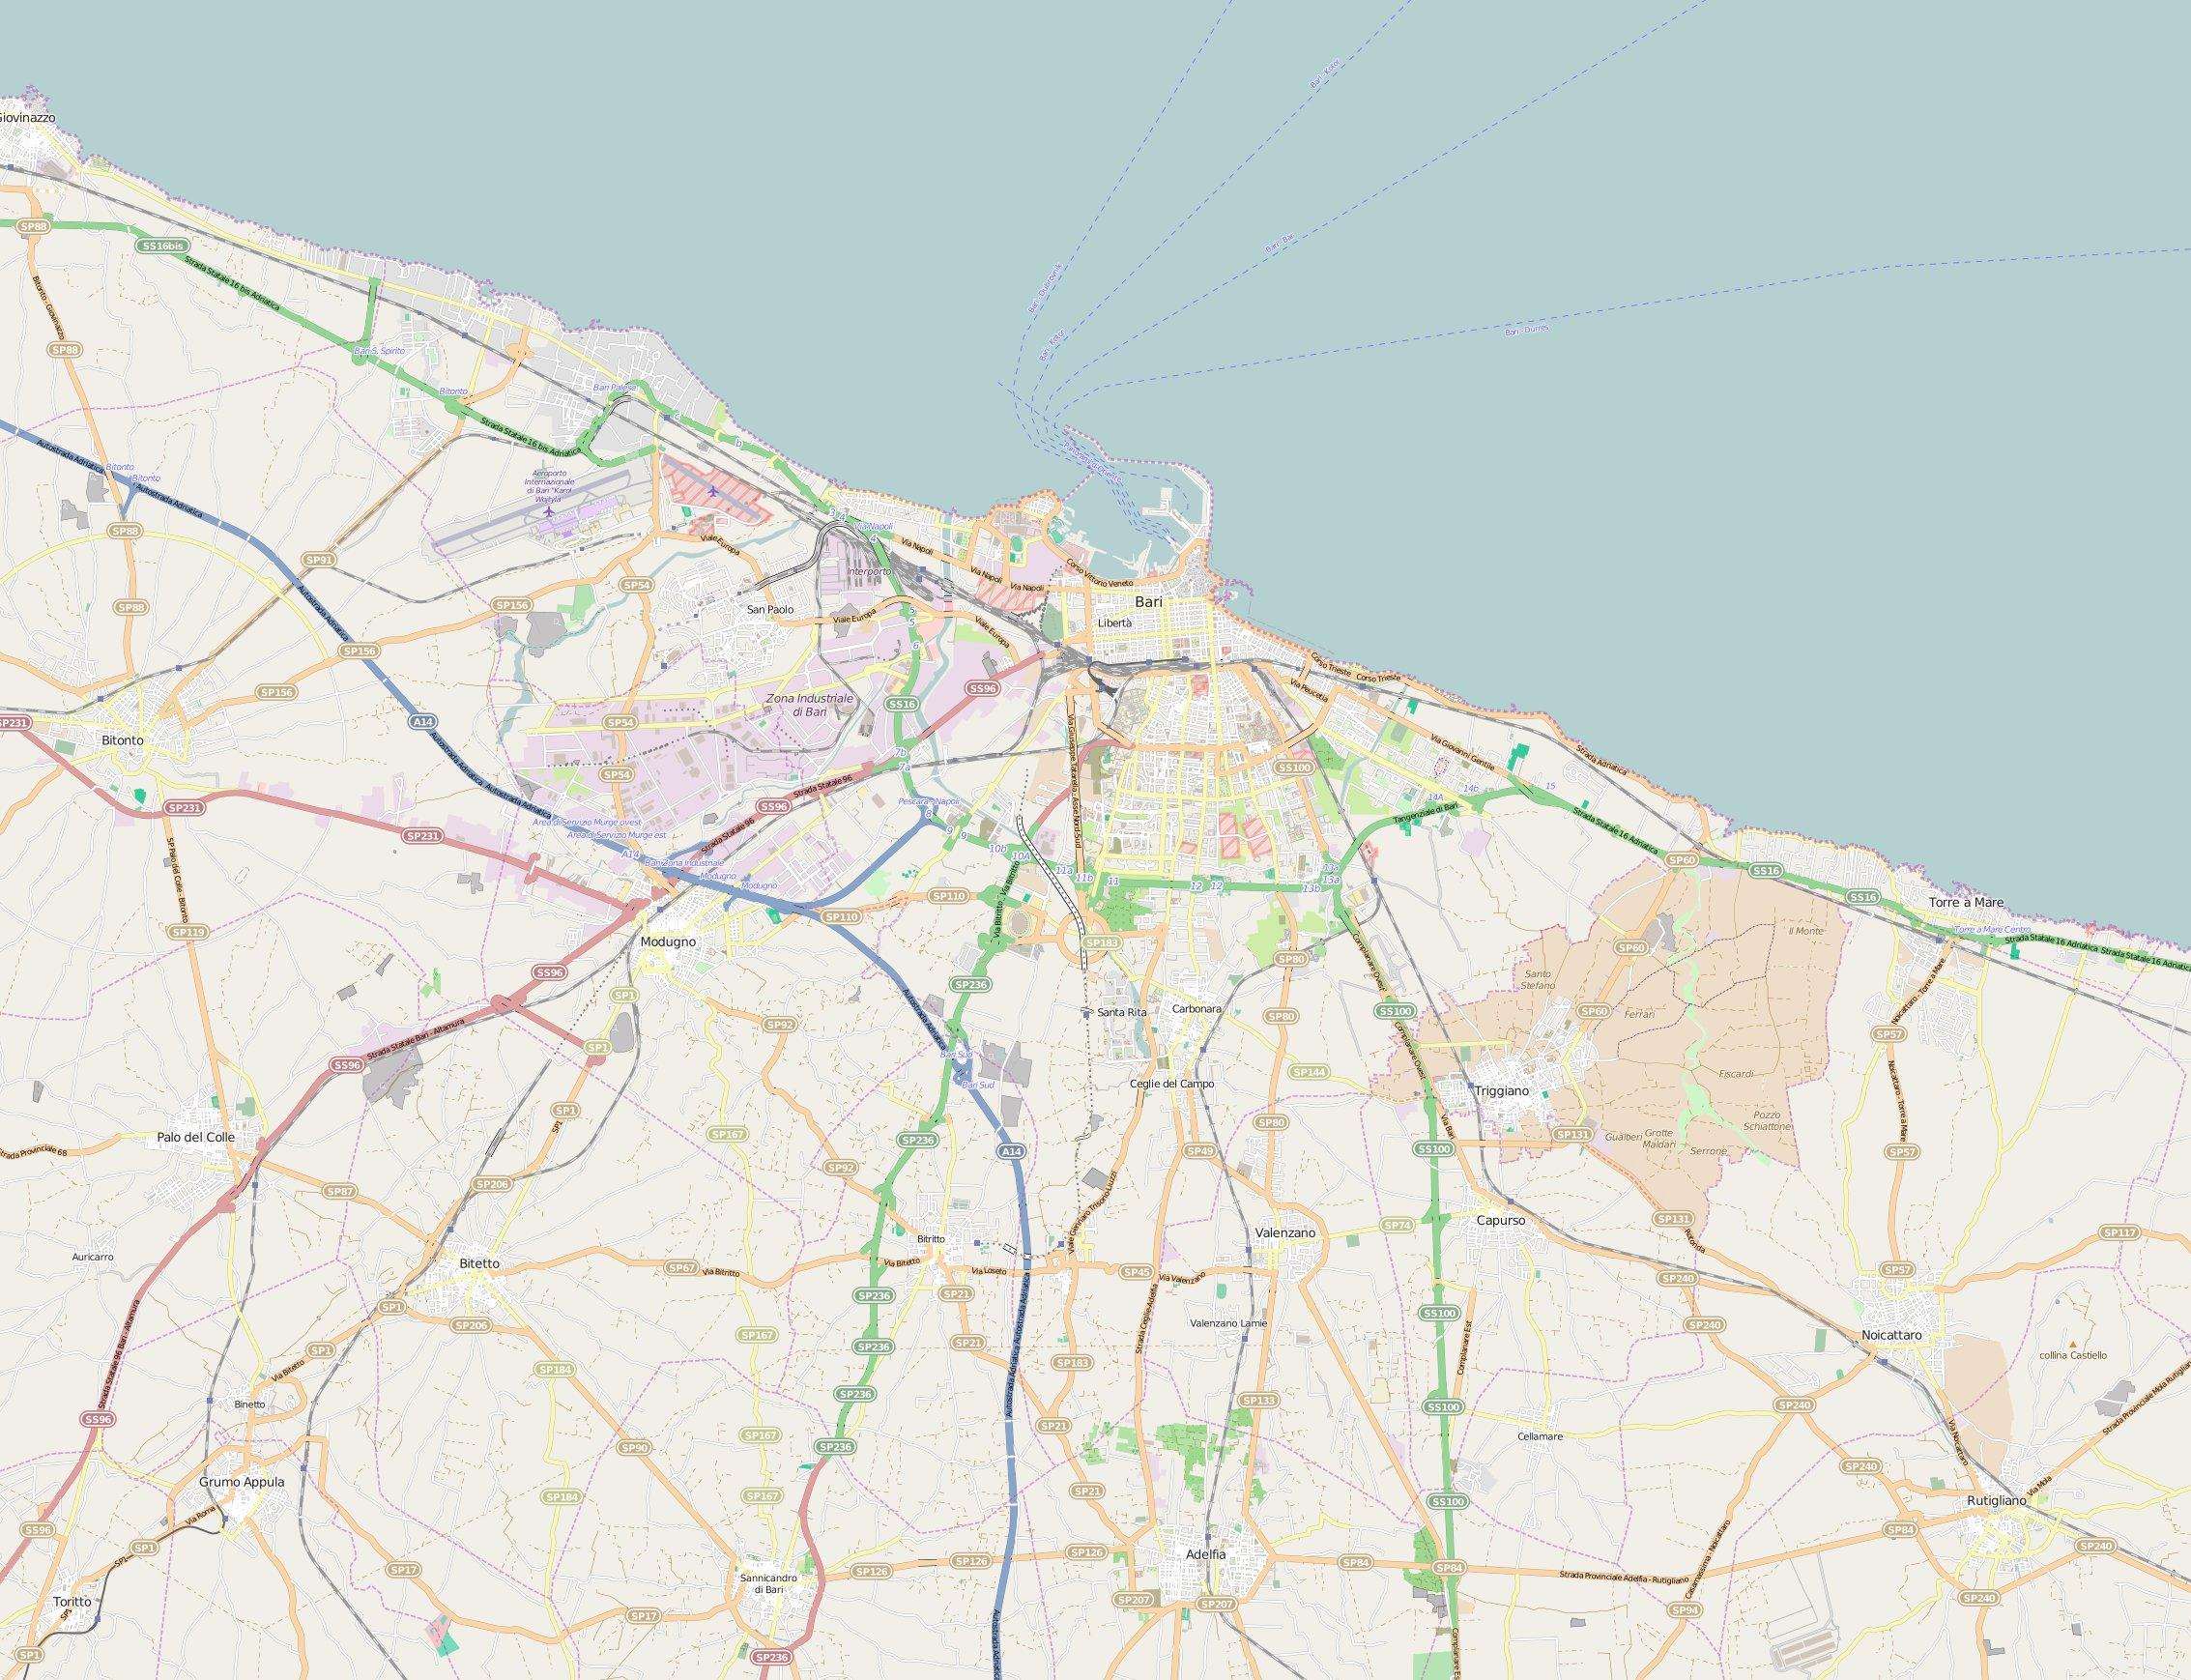 FileLocation Map Barijpg Wikimedia Commons - Bari map